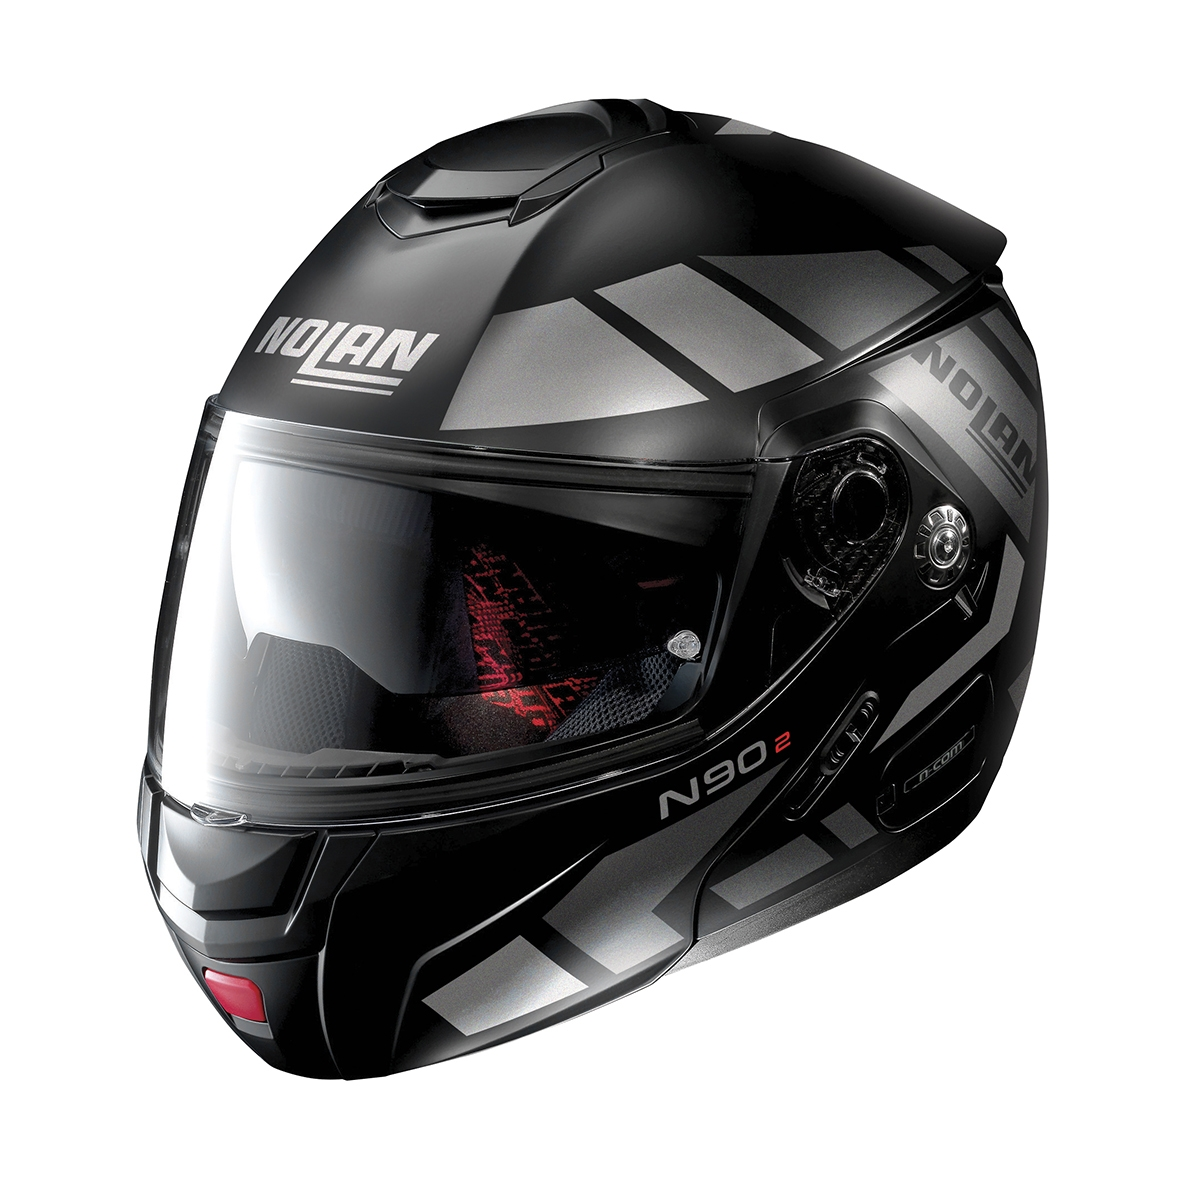 Moto helma Nolan N90-2 Euclid N-Com Flat Black 26